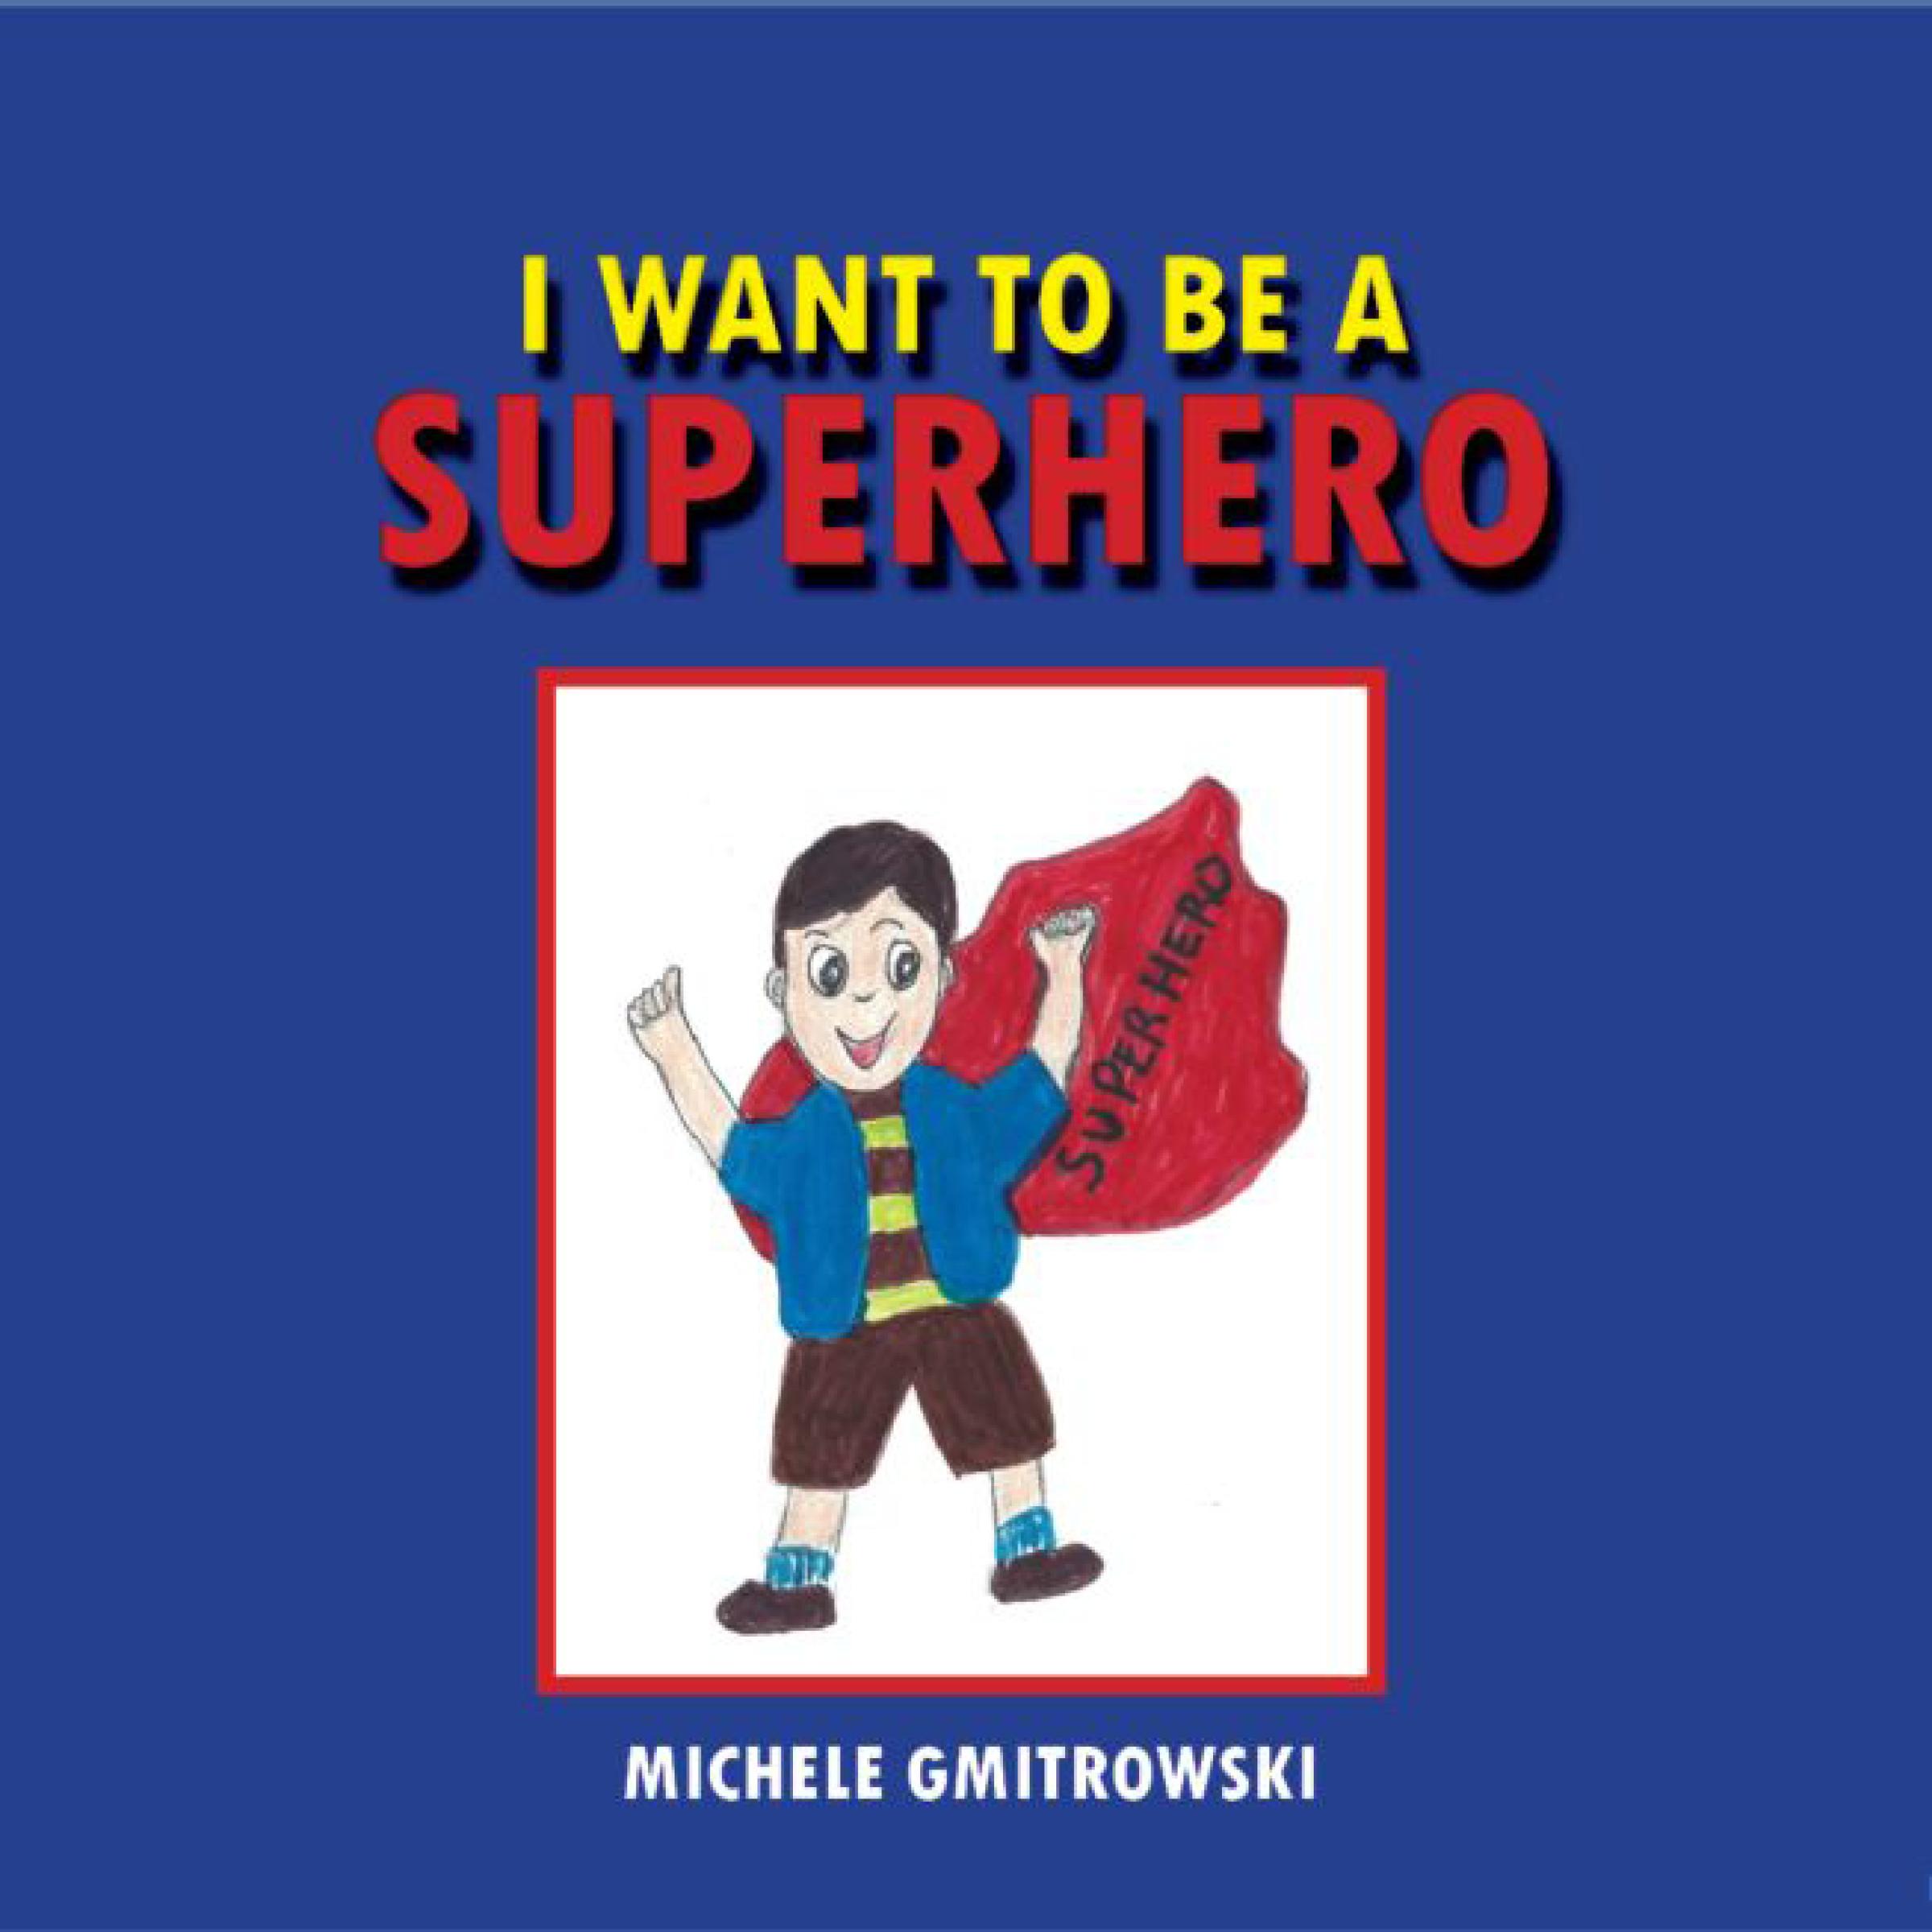 I WANT TO BE A SUPERHERO BY MICHELE GMITROWSKI